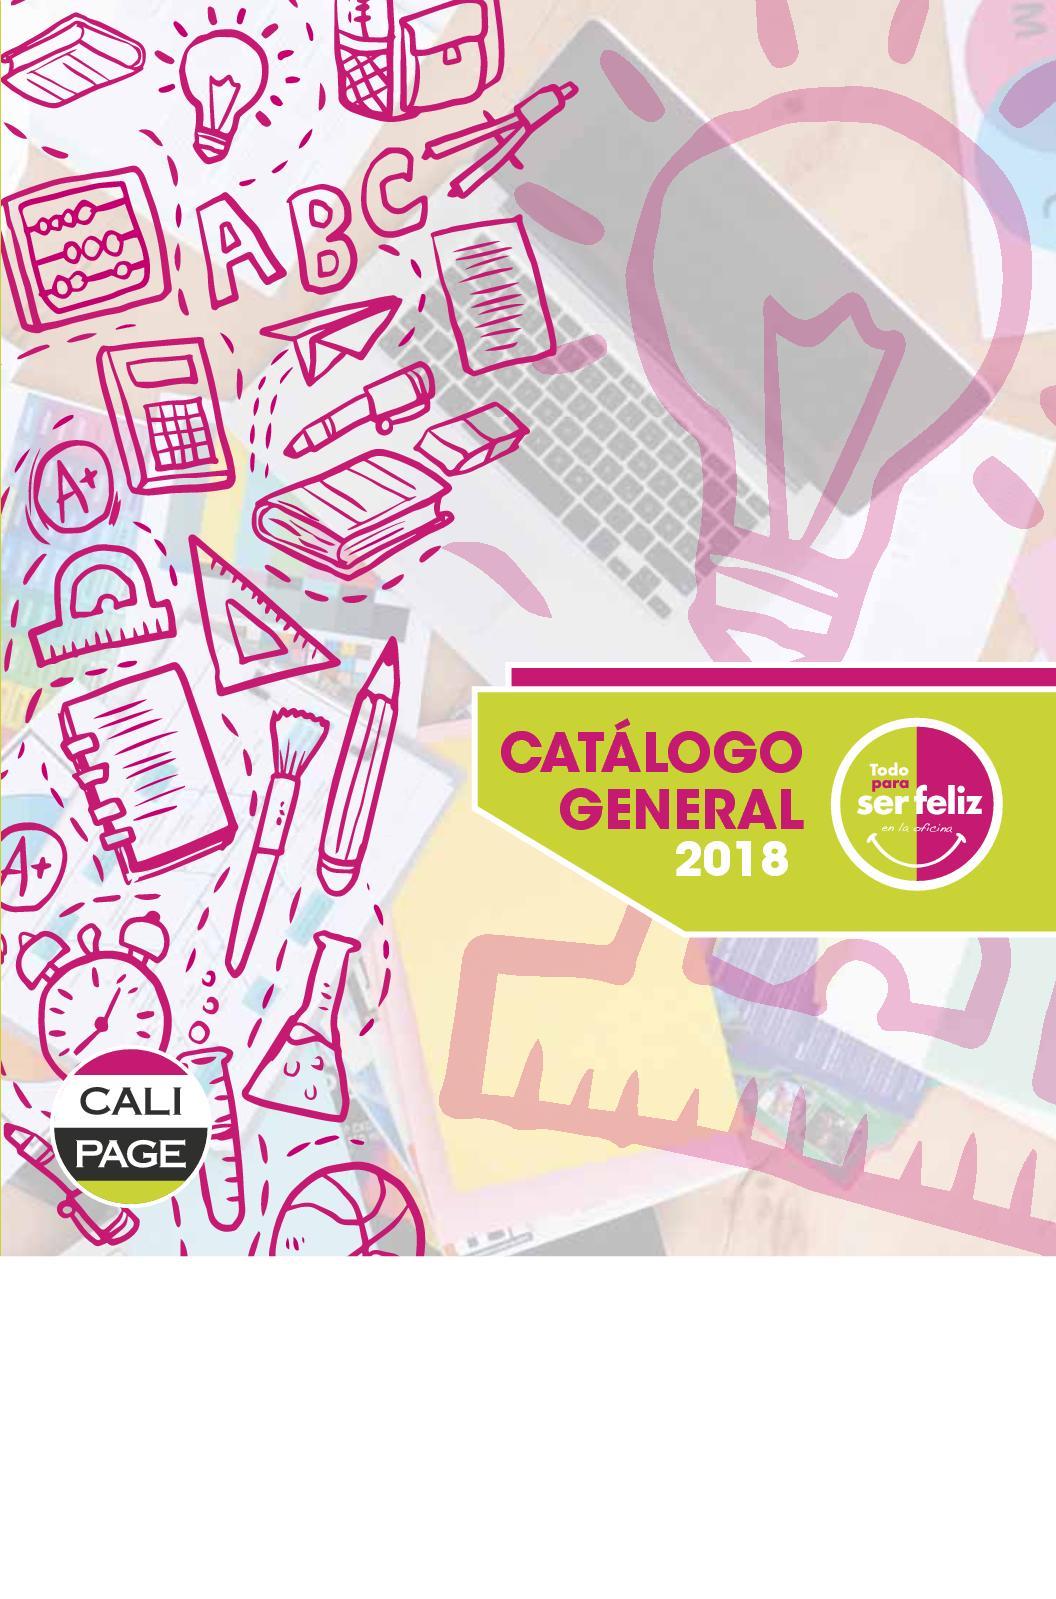 b29cc57cd78 Calaméo - Catalogo General 2018 Material Oficina